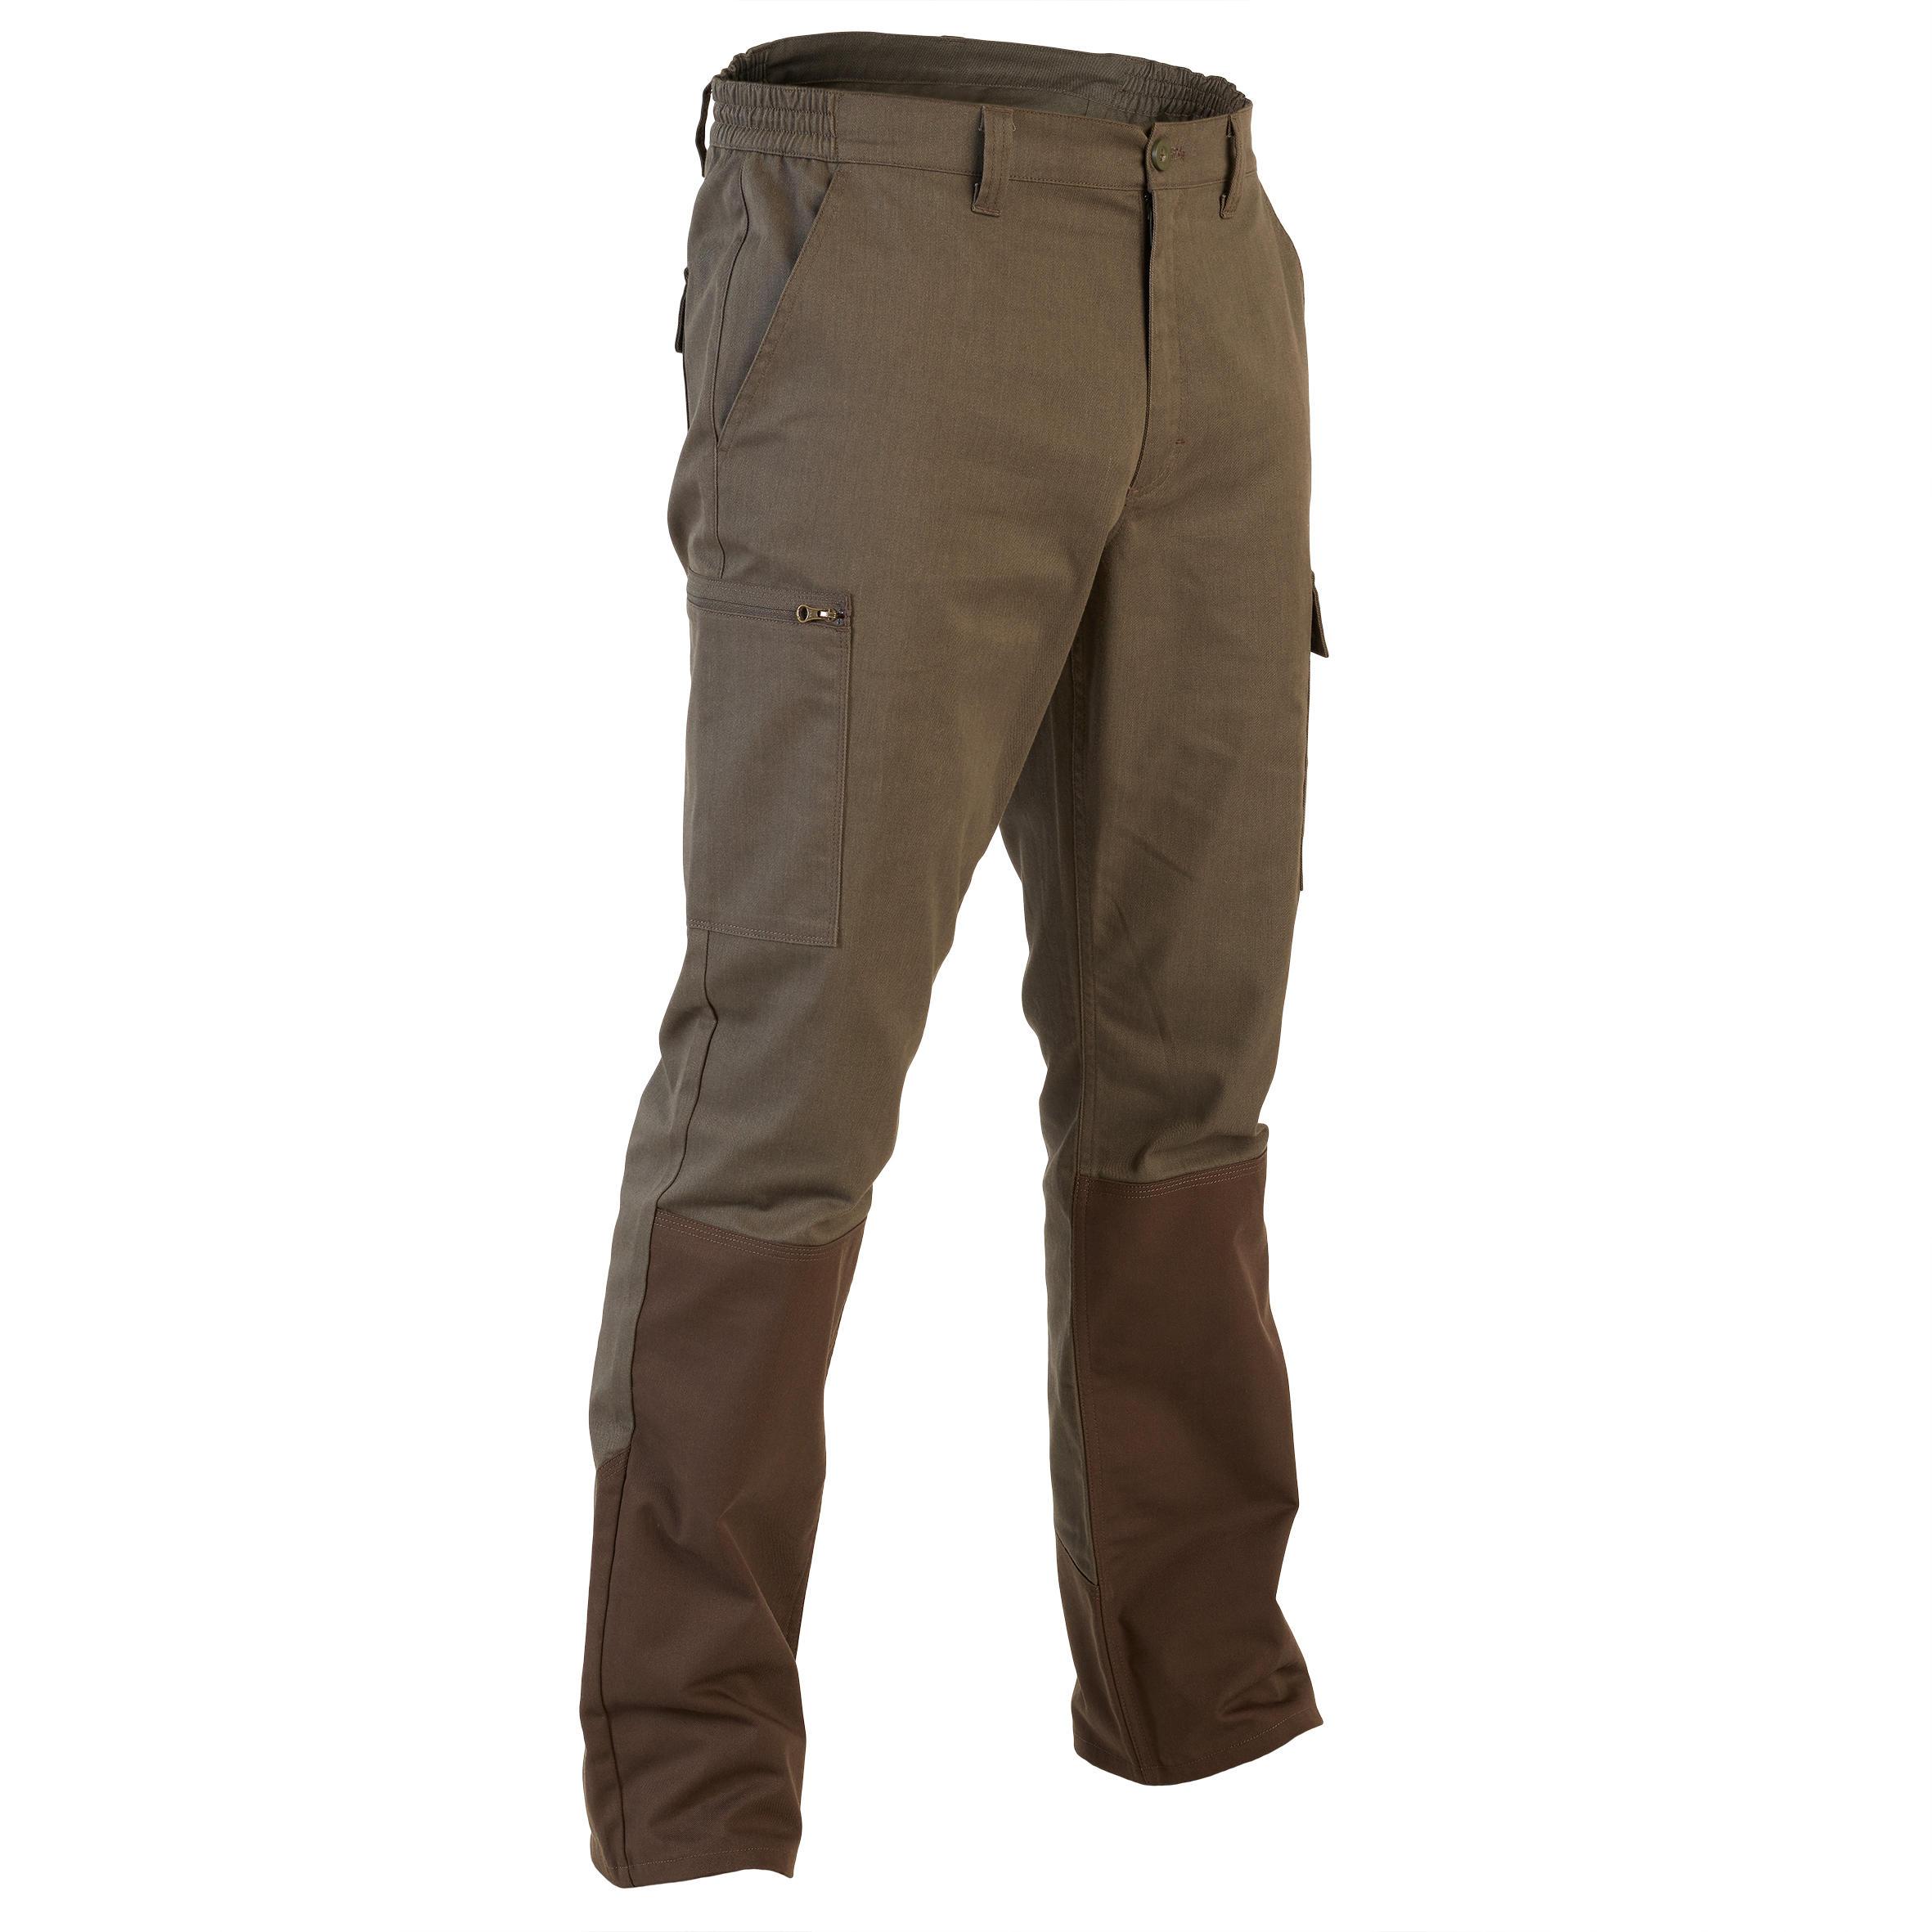 JAGDHOSE 320 RENFORT   Sportbekleidung > Sporthosen > Trekkinghosen   Solognac